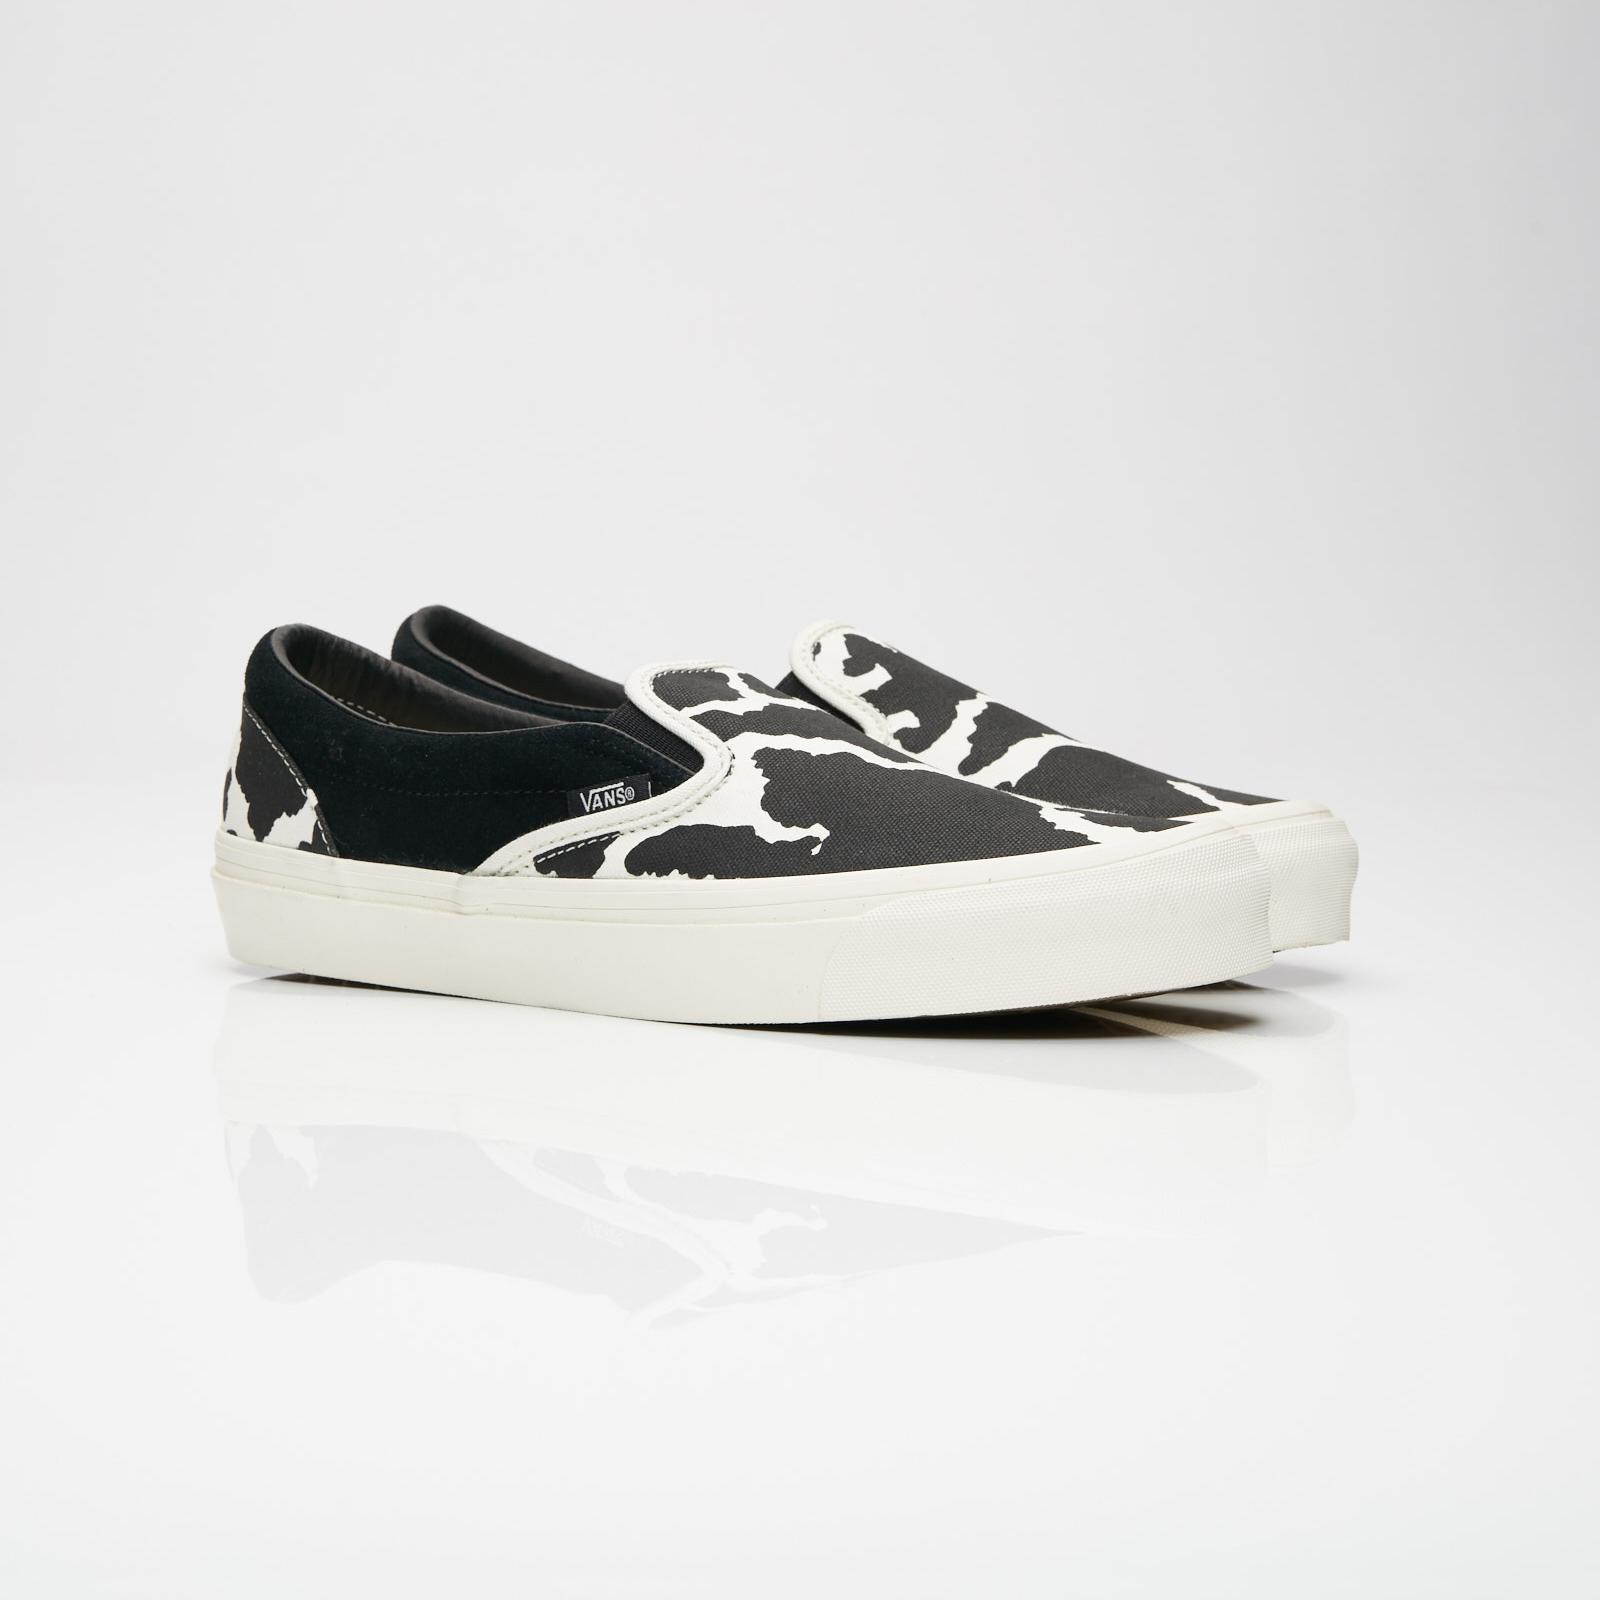 9be4dfa41e Vans UA OG Classic Slip-On LX - V00udfu9o - Sneakersnstuff ...